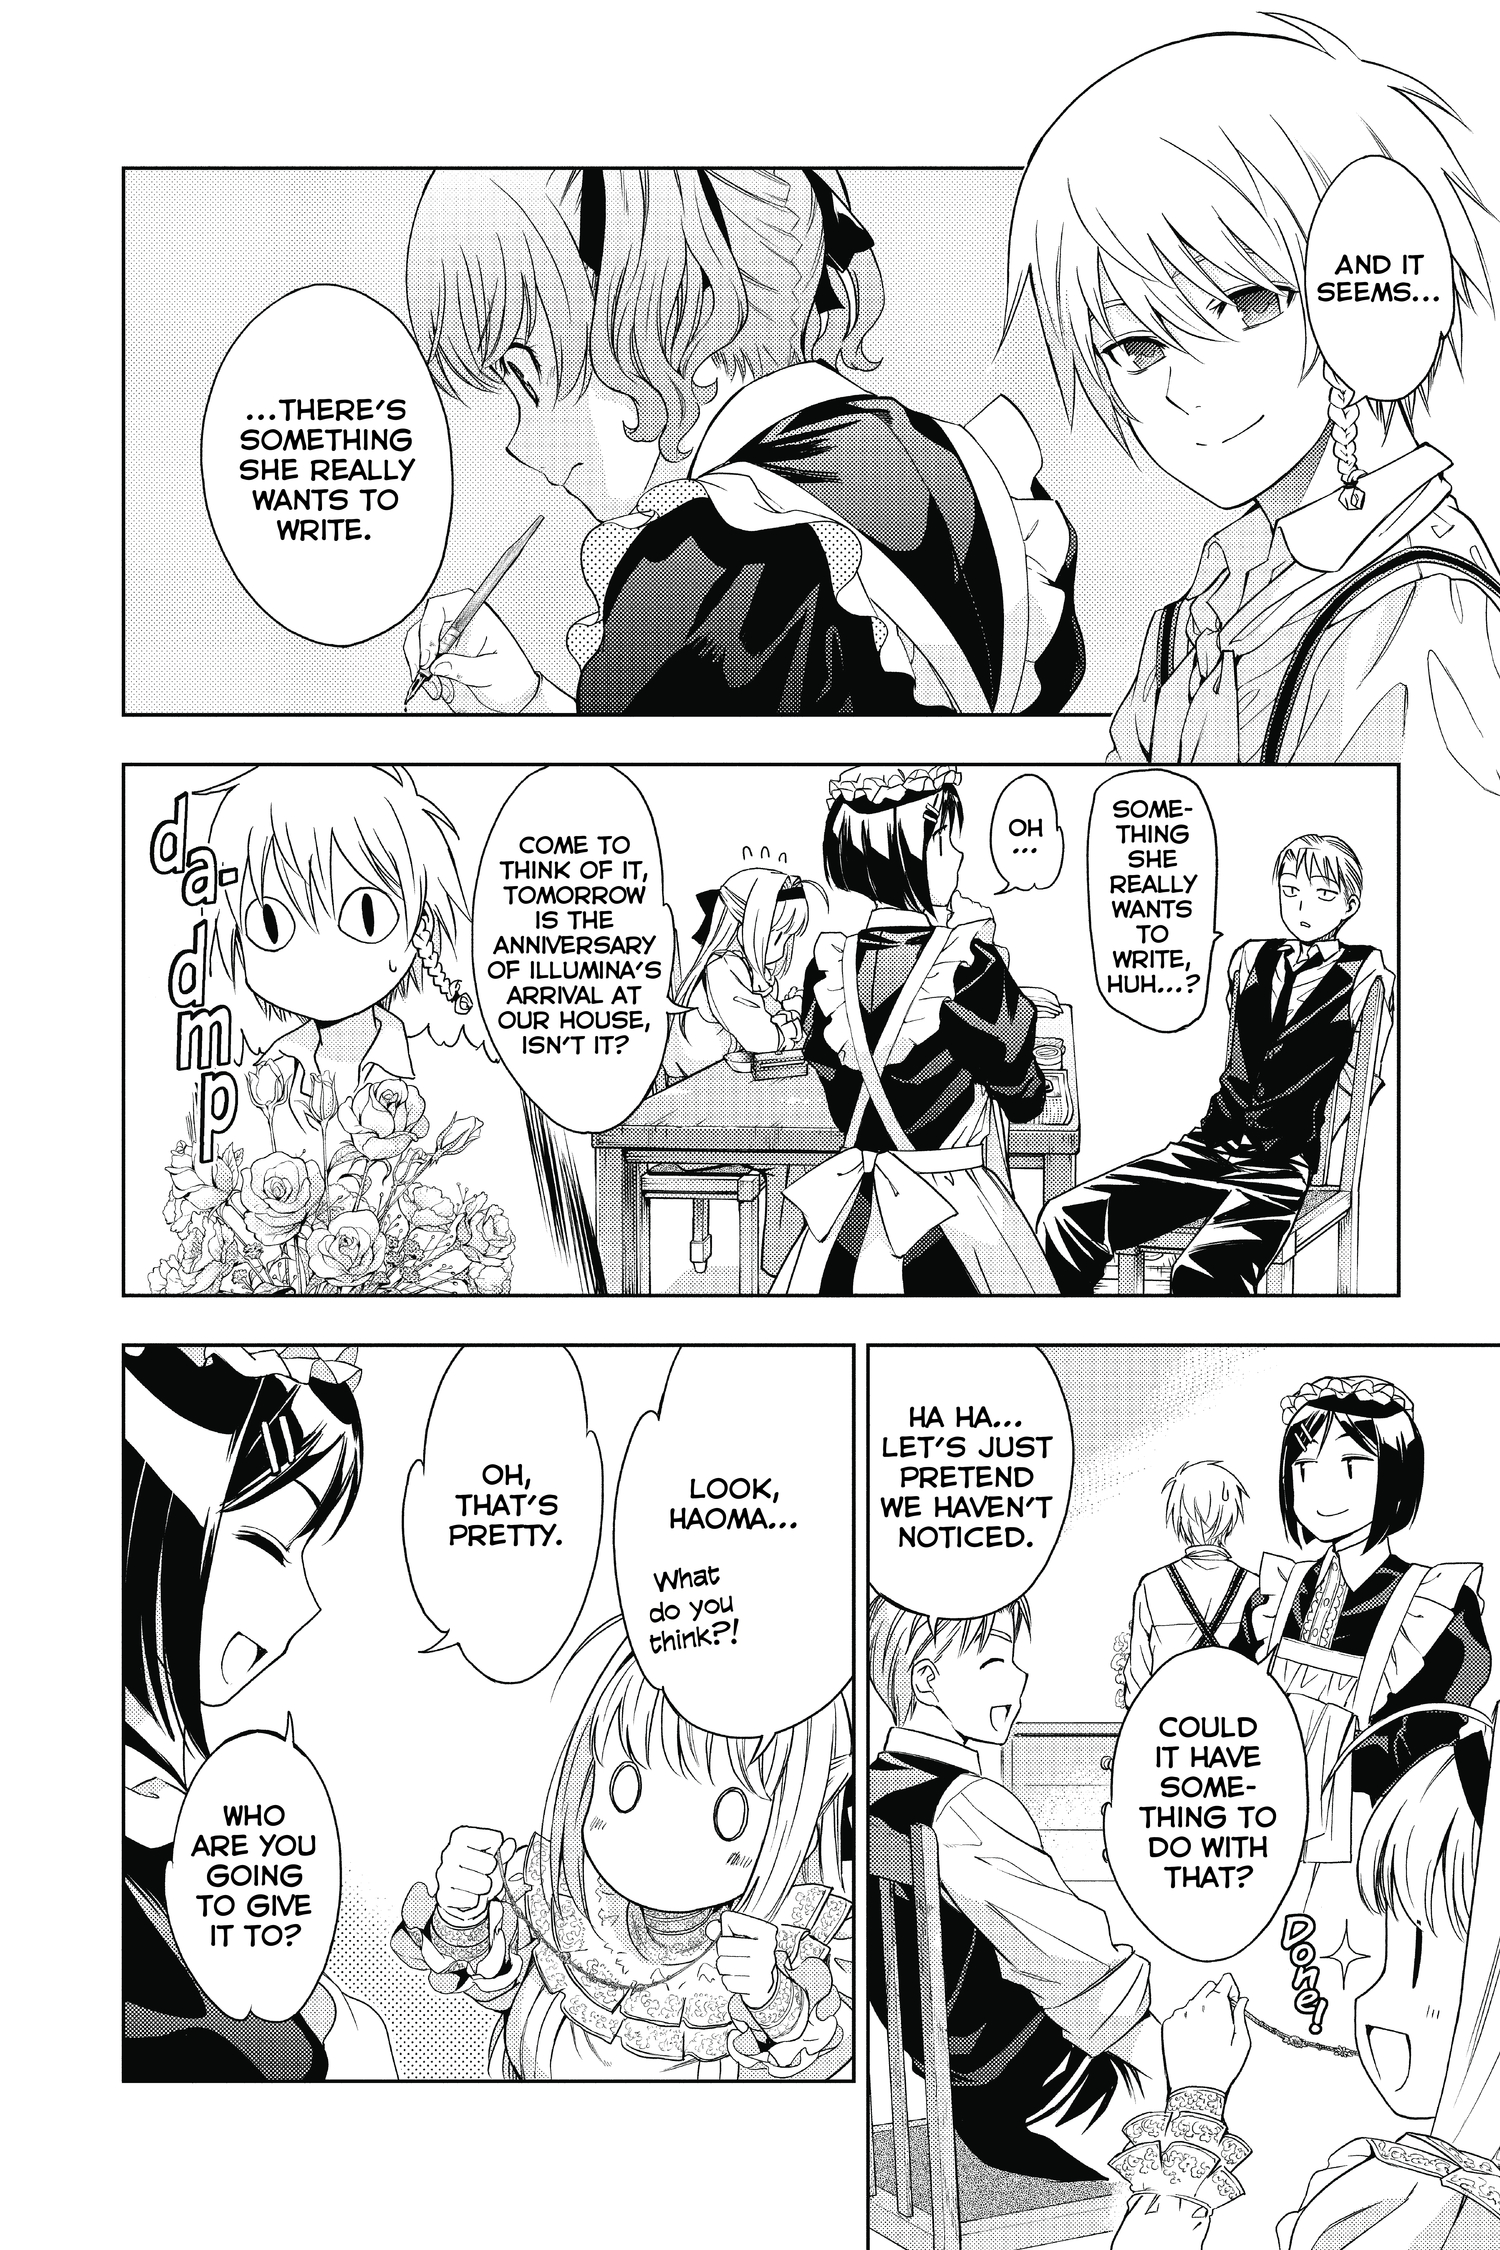 7th Garden Manga Volume 5